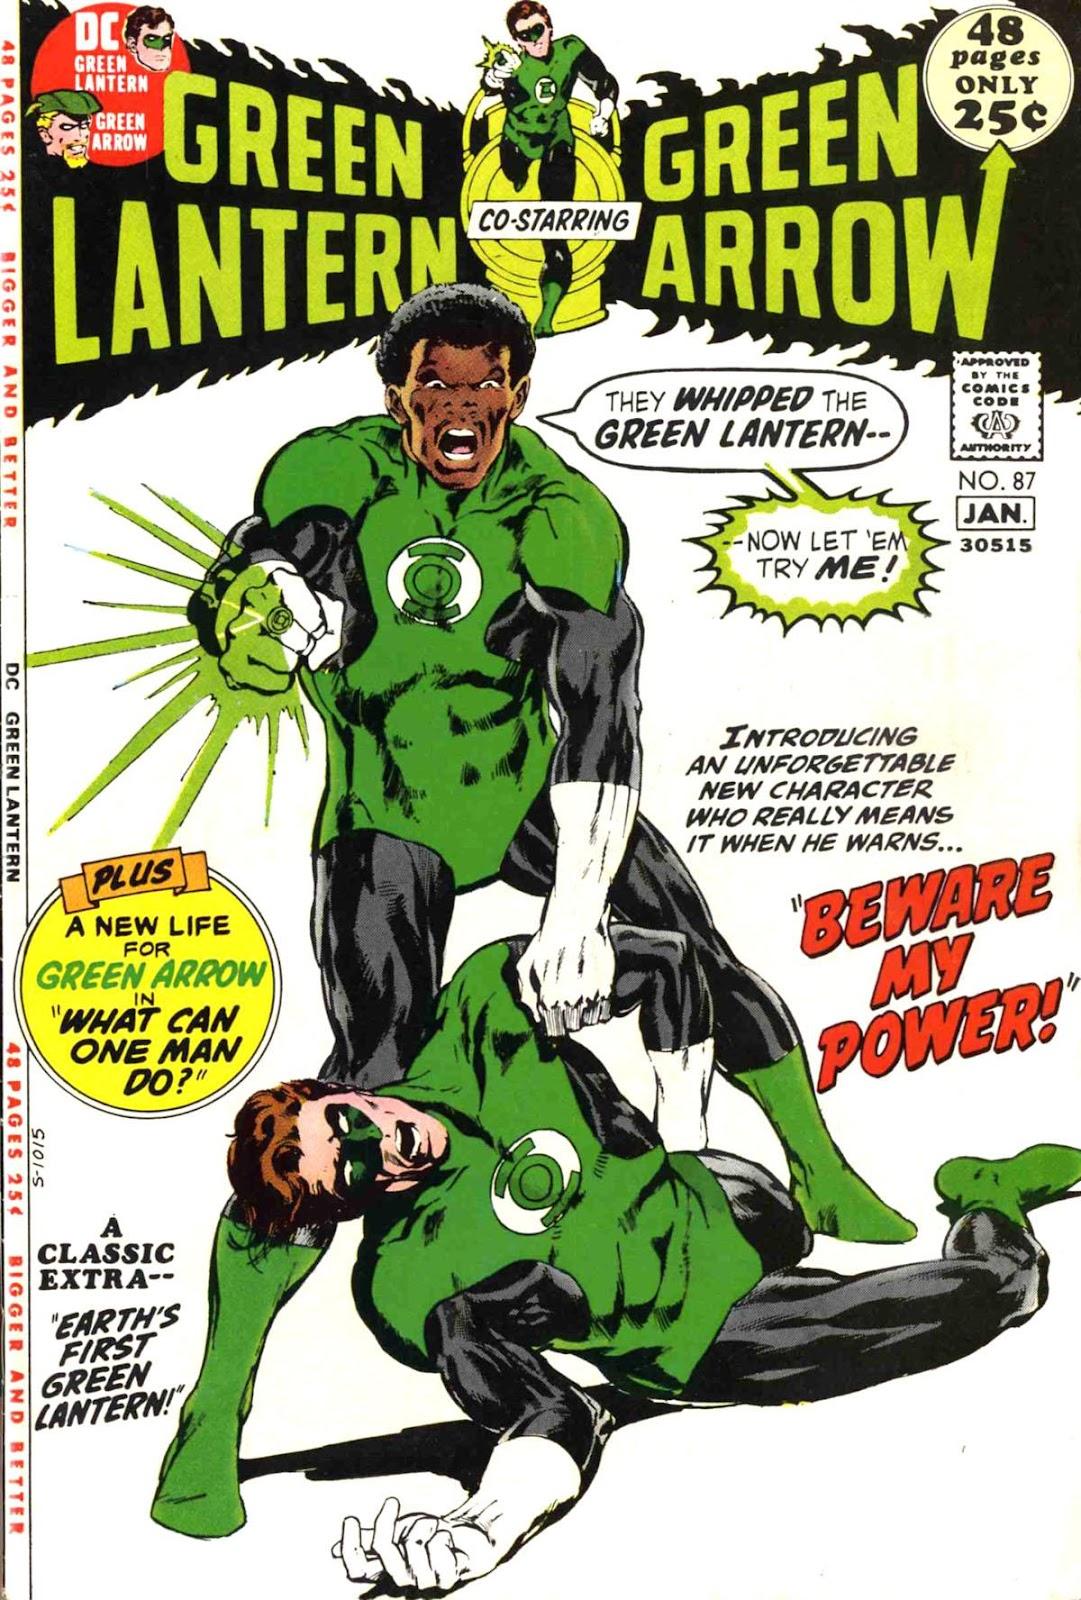 Image result for green lantern 87